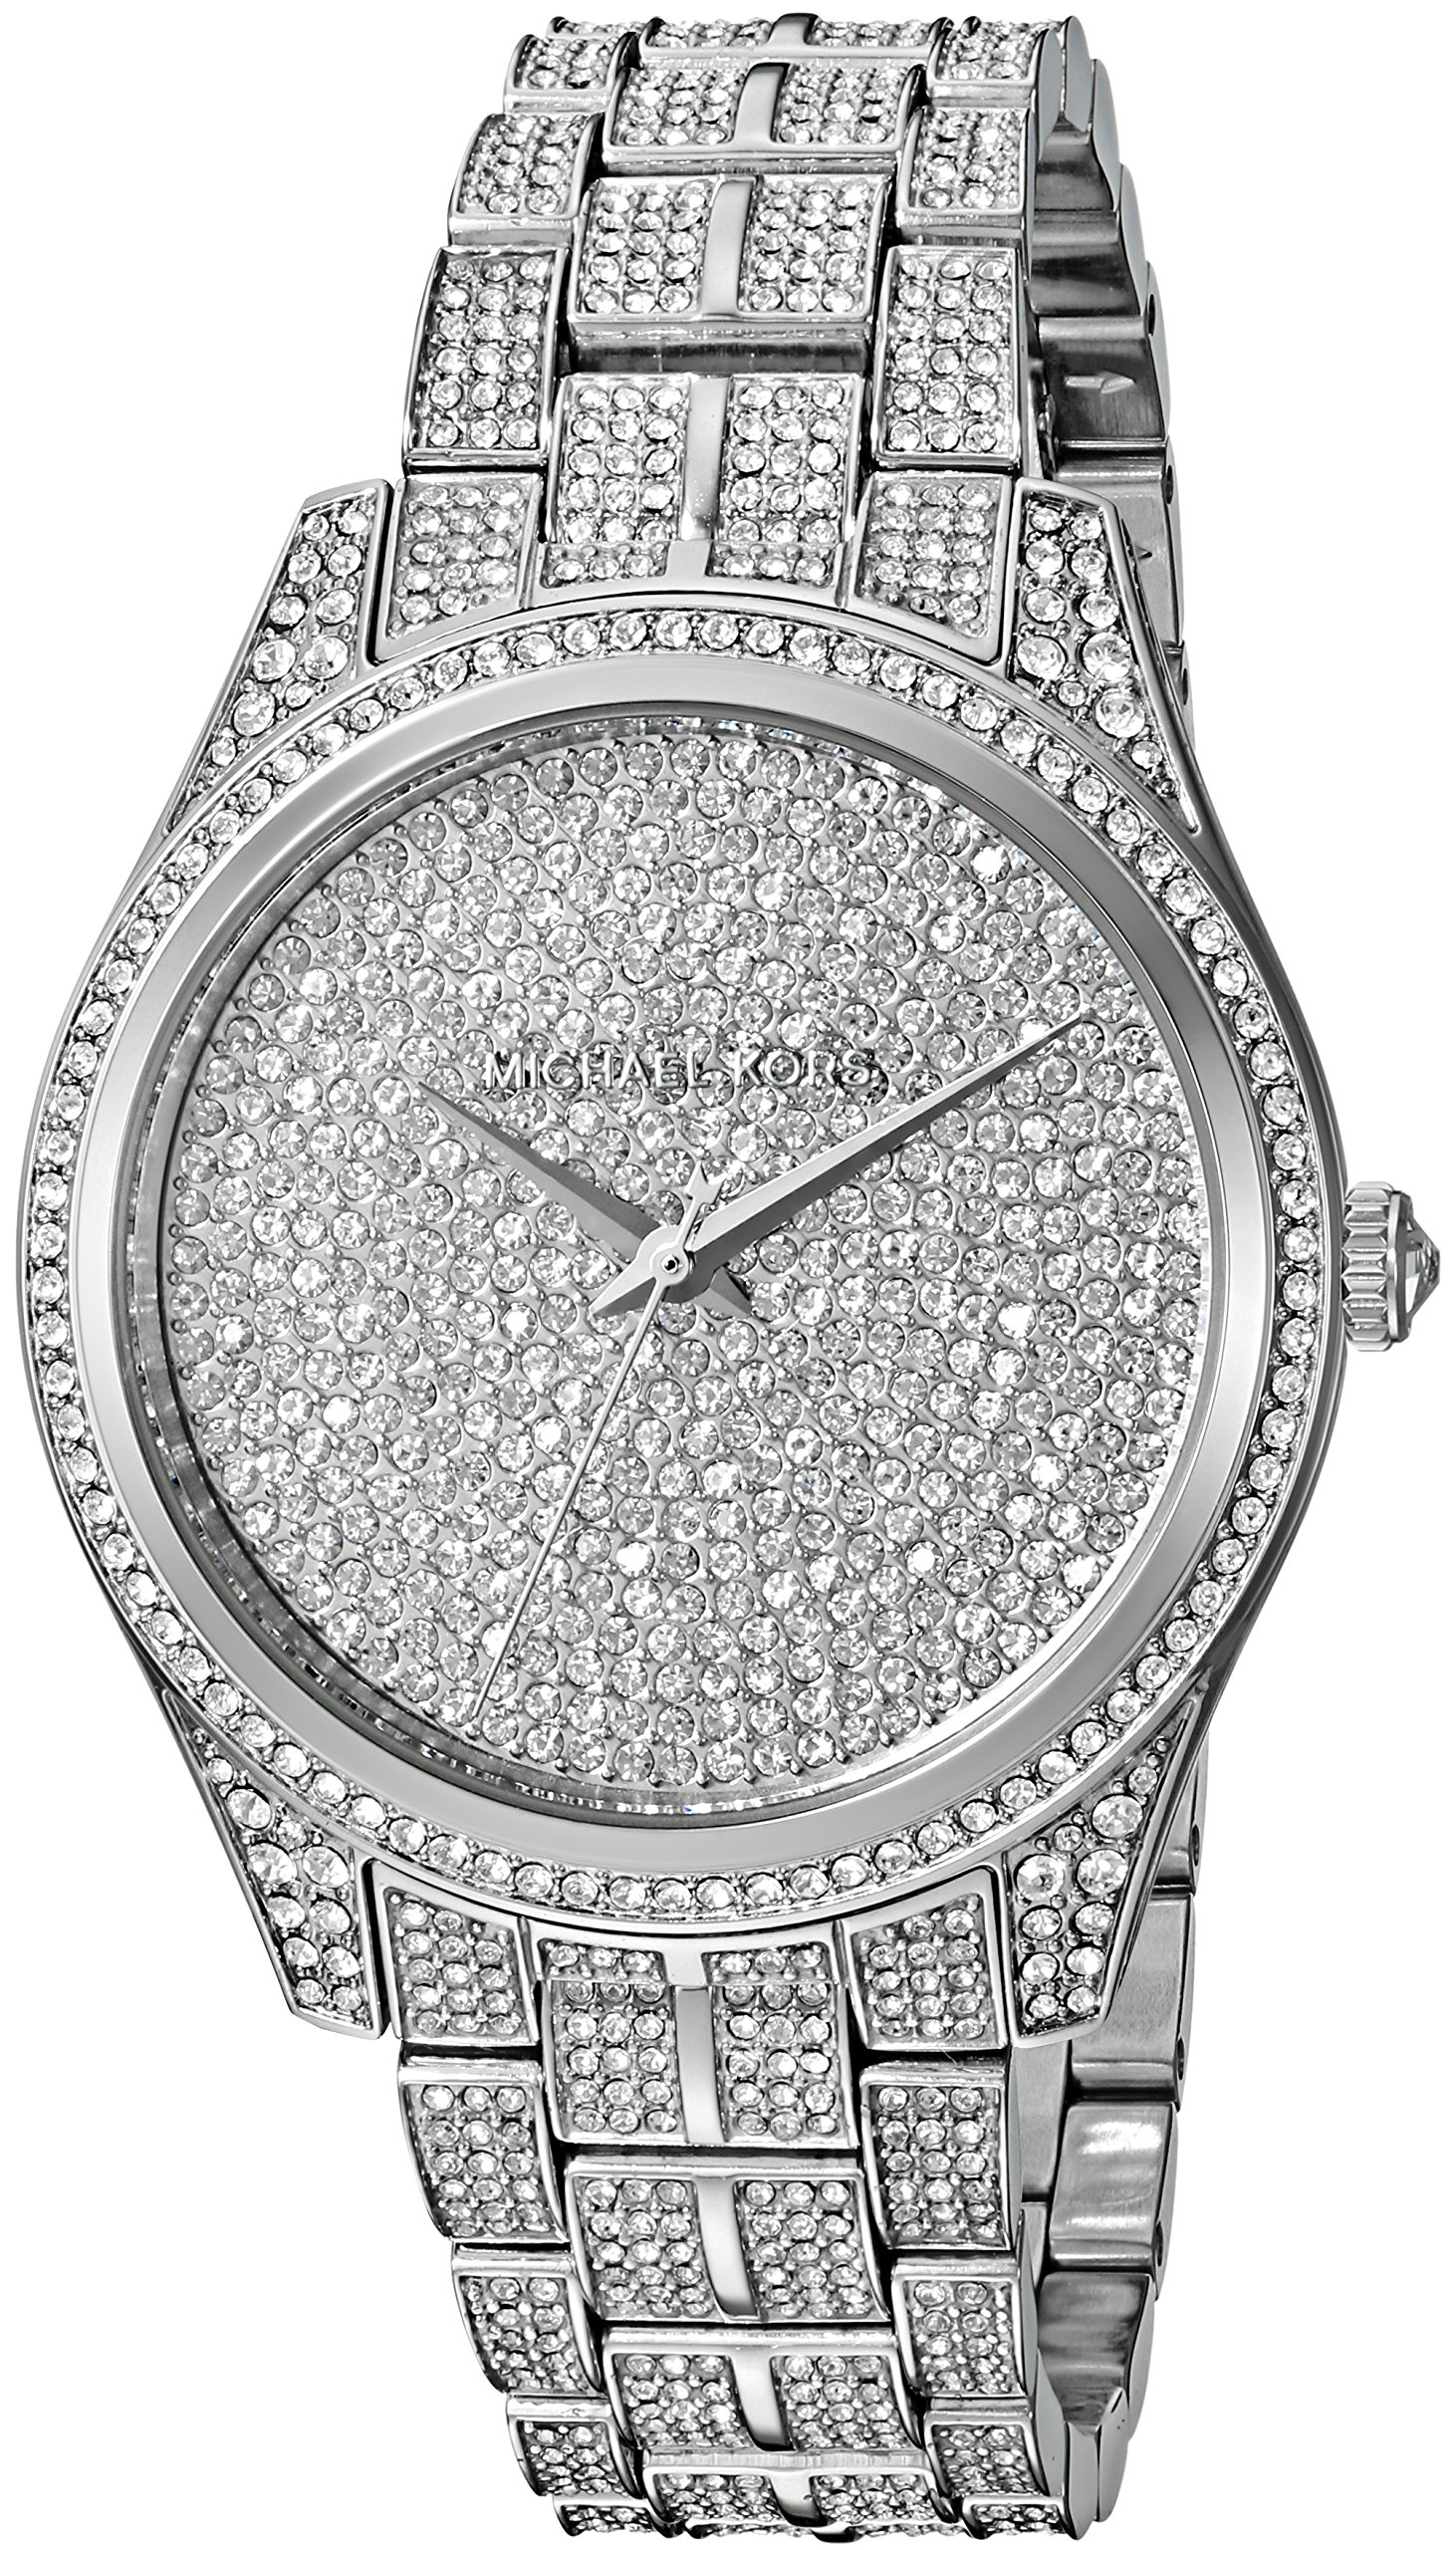 Michael Kors Women's 'Lauryn' Quartz Stainless Steel Casual Watch, Color:Silver-Toned (Model: MK3717)